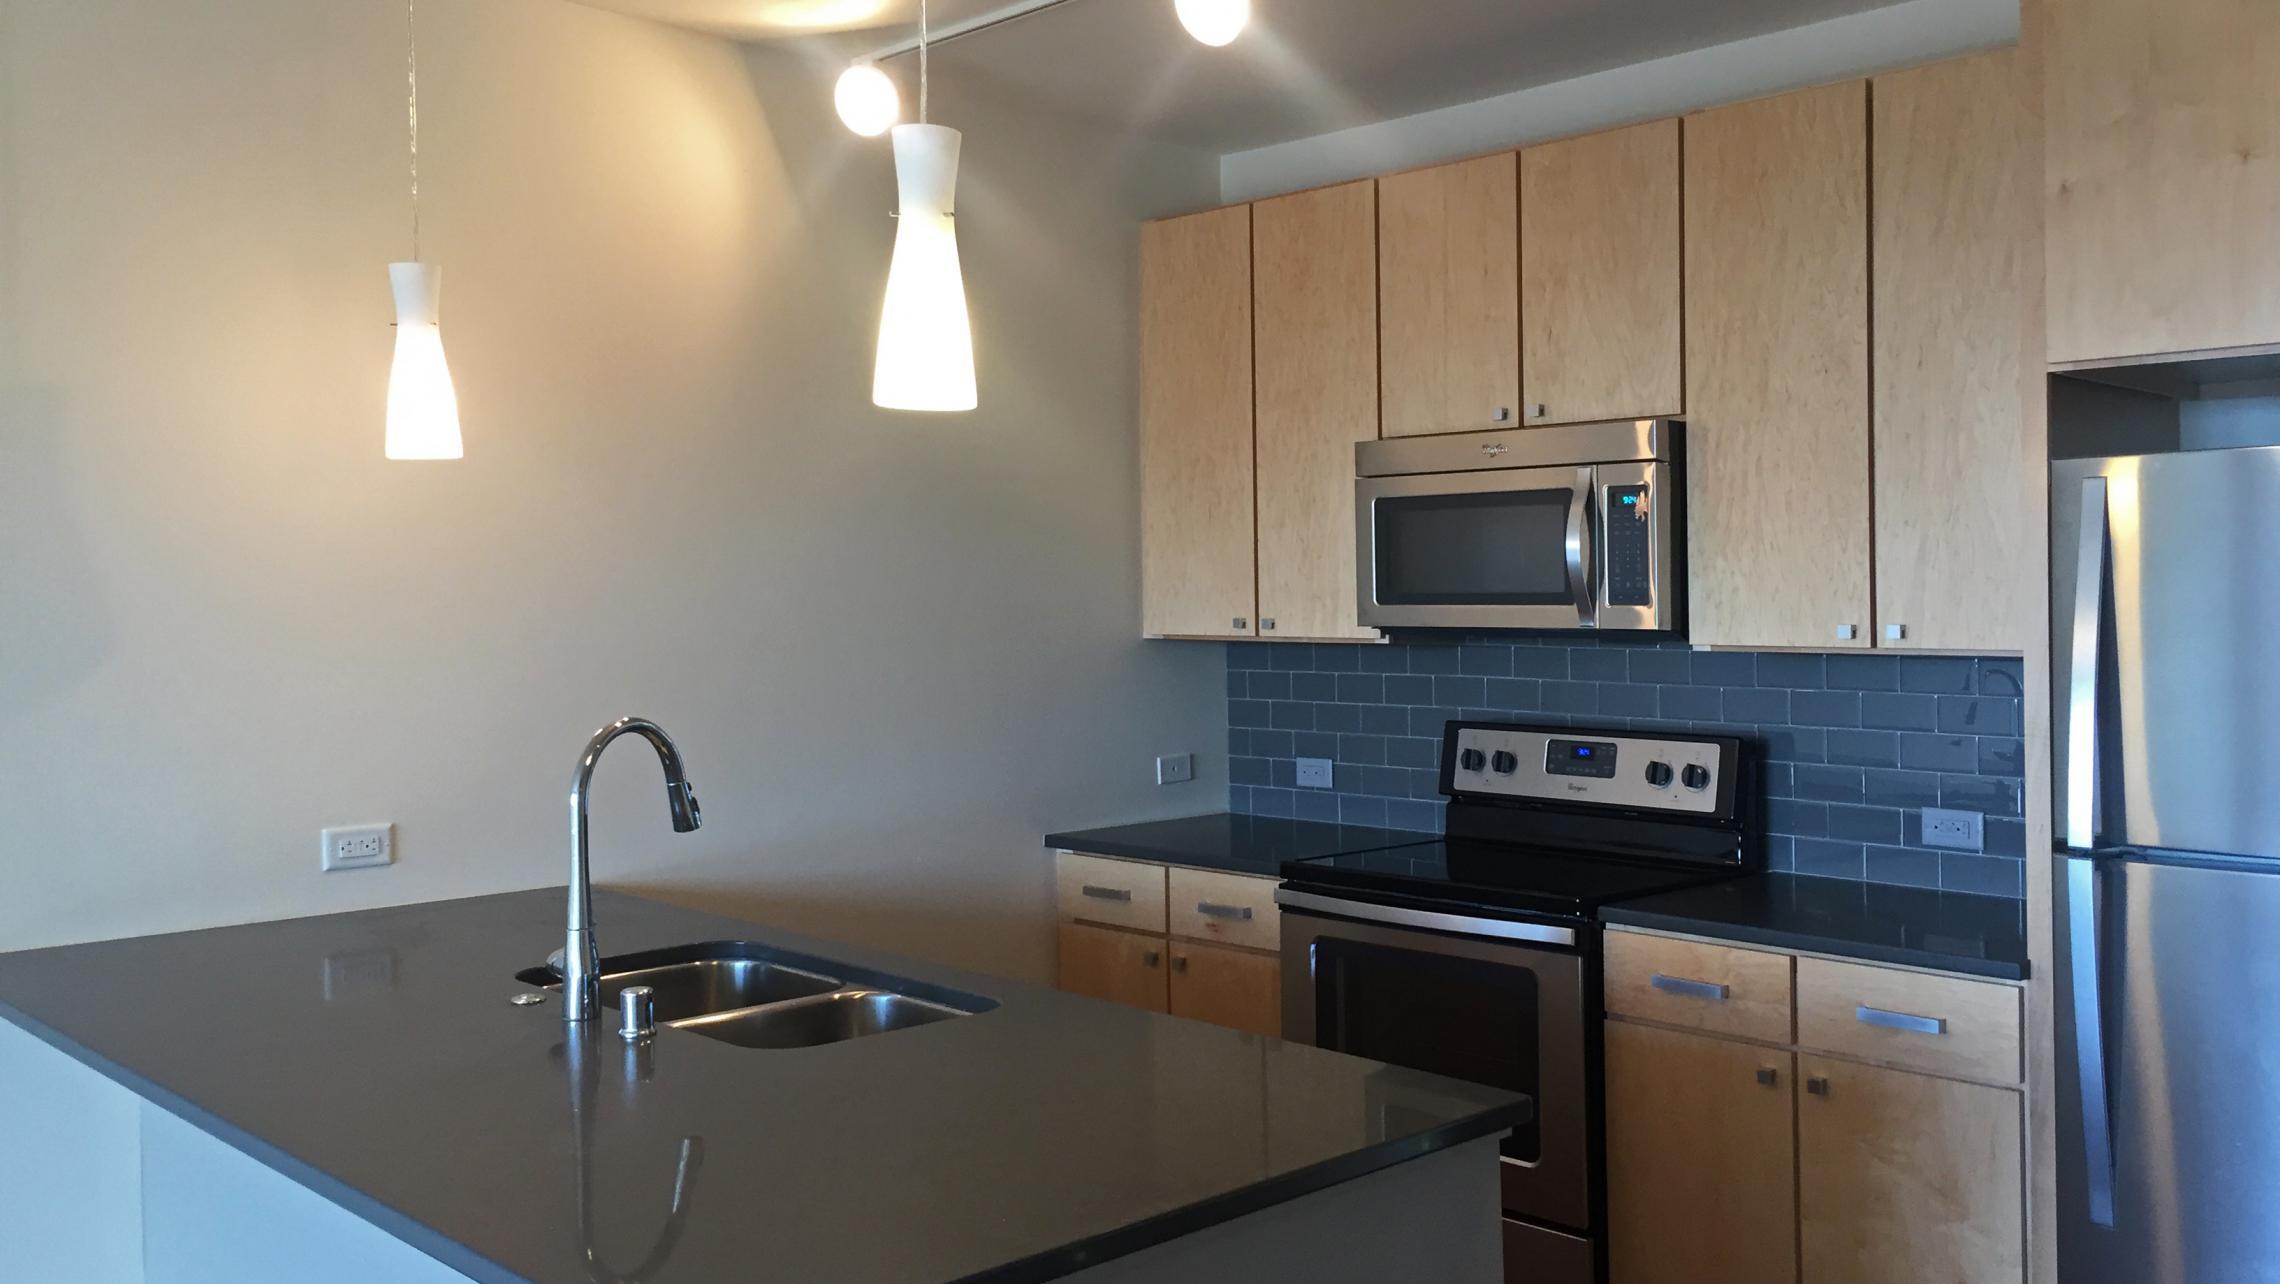 ULI Nine Line Apartment 223 - Kitchen